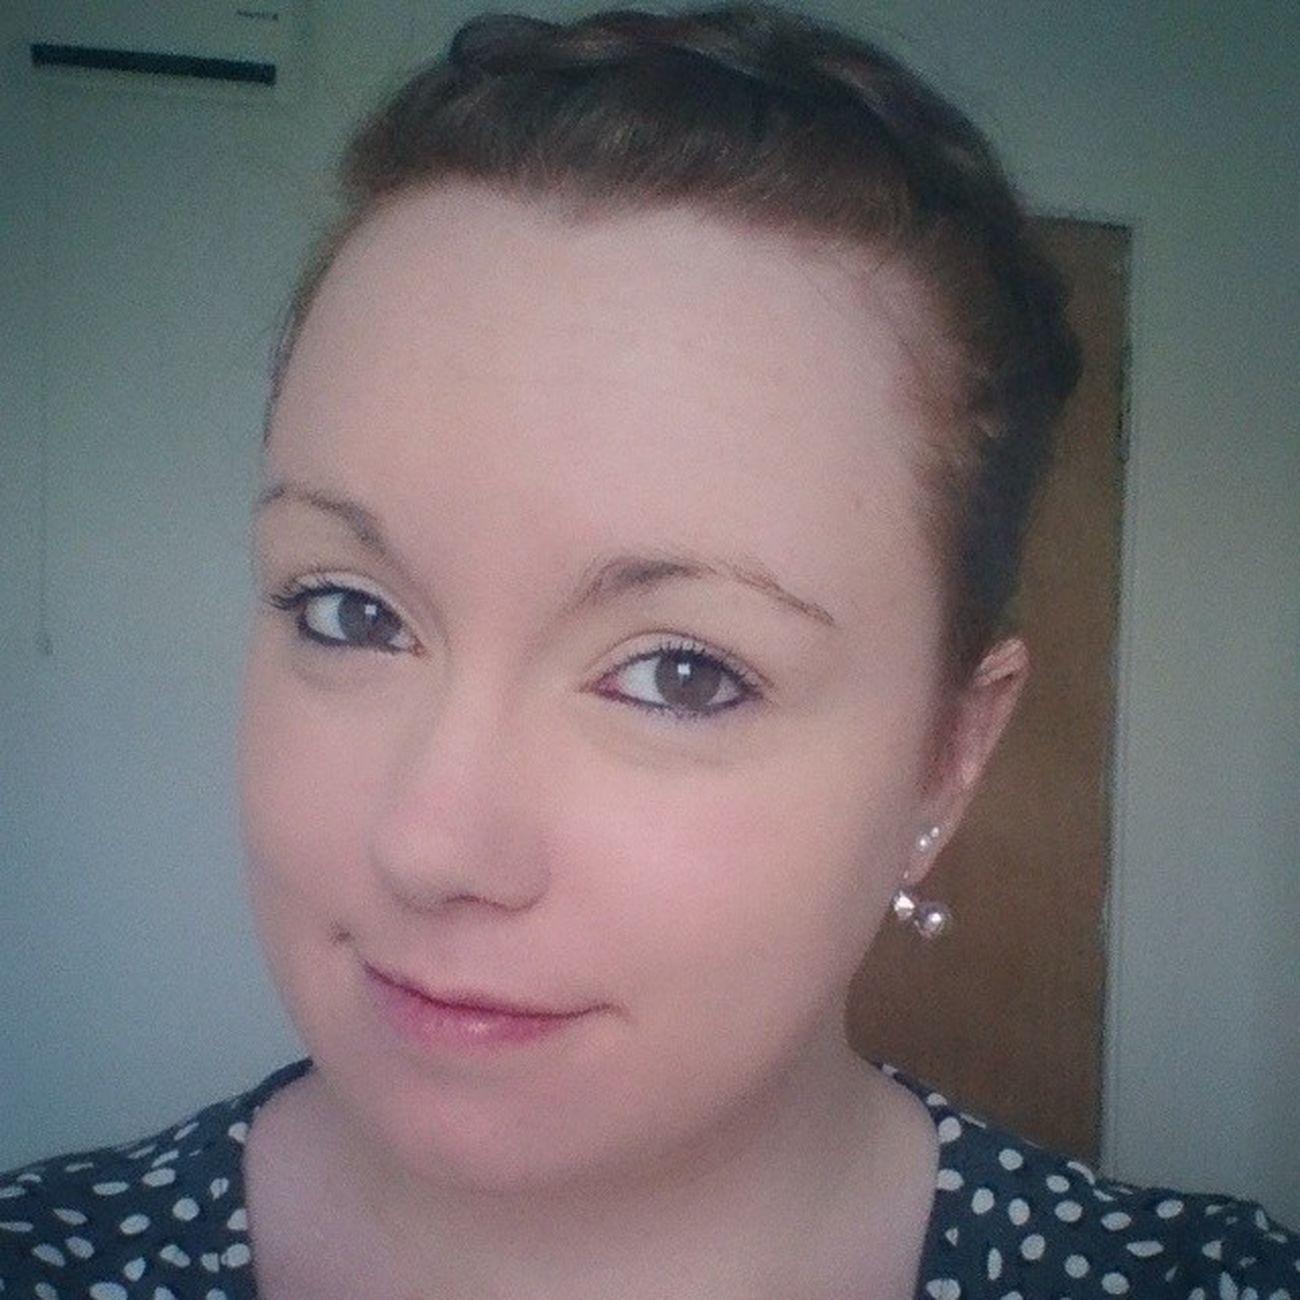 It's hump day at least! Headed to work Sad Selfie Workselfie Redhead gingersofinstagram